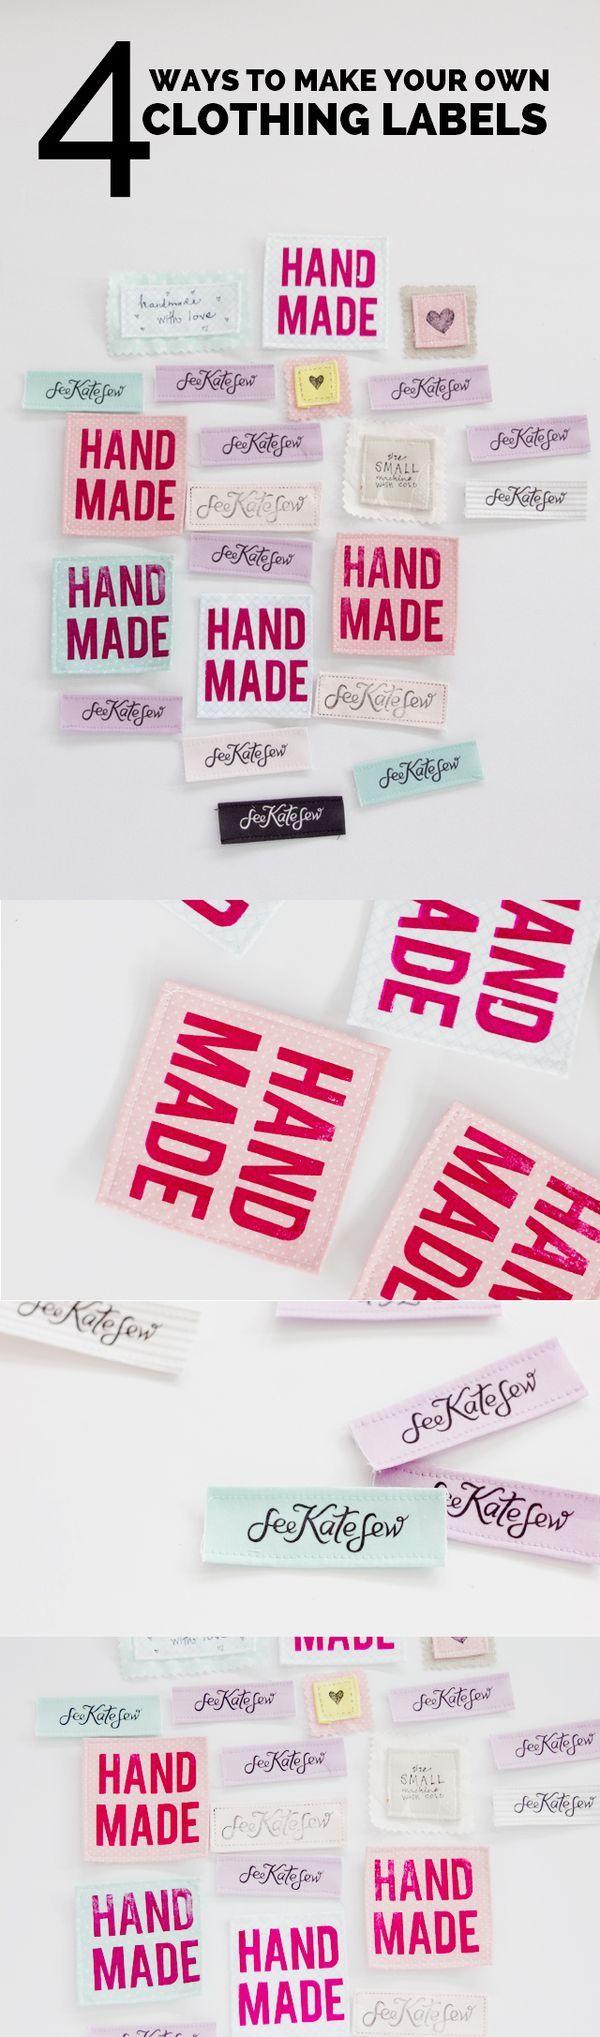 Best 25 Custom Labels Ideas On Pinterest Make Your Own